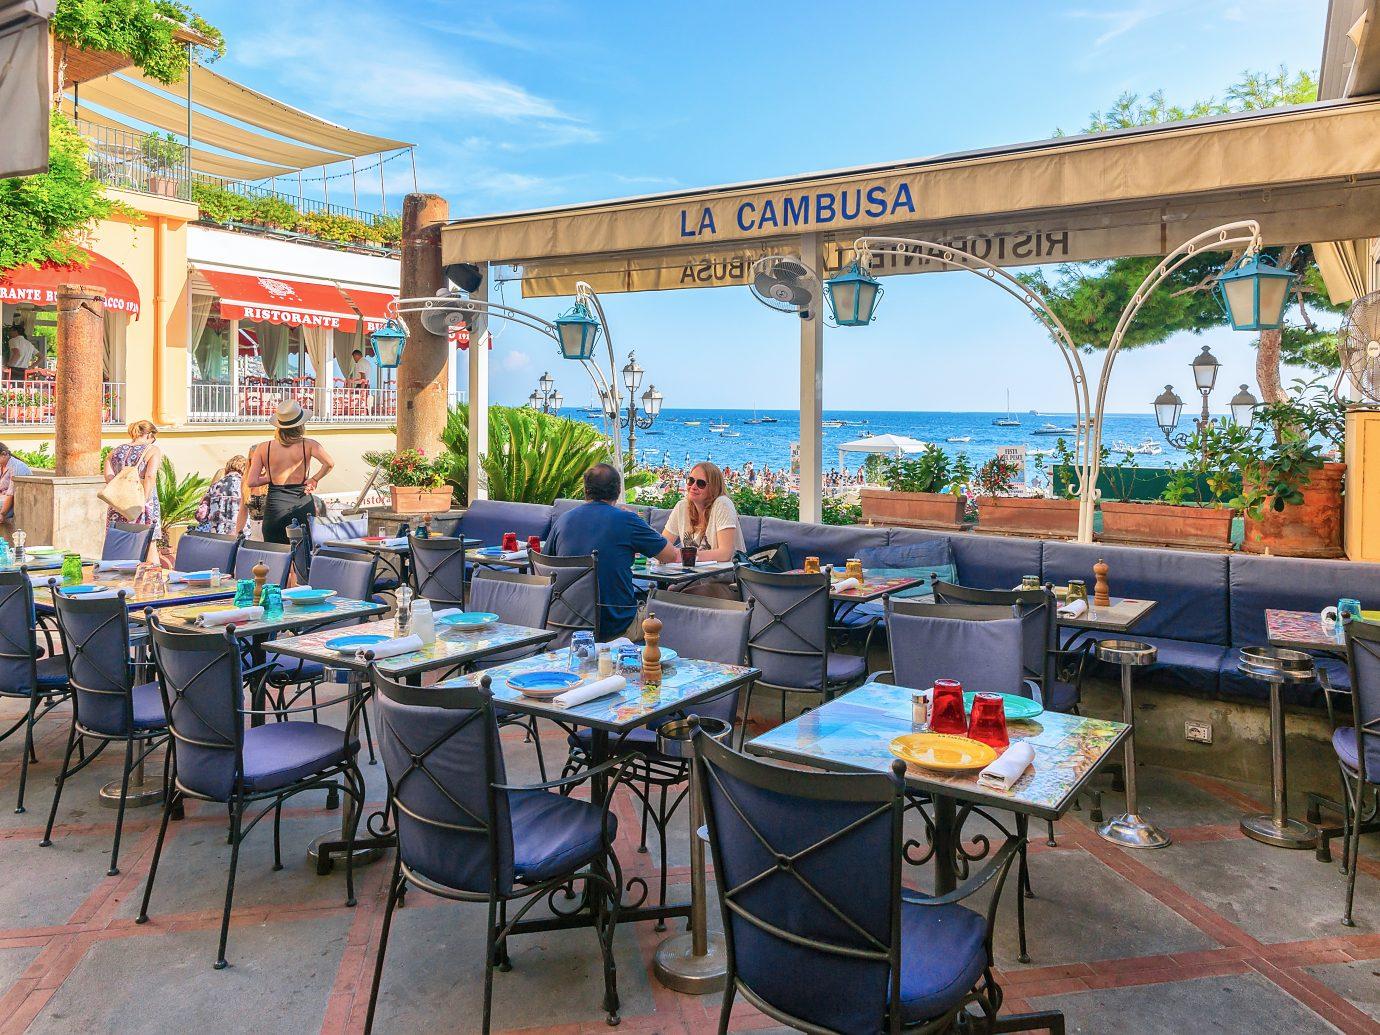 Street terraced cafe in Positano town and Tyrrhenian sea in Amalfi coast, Italy